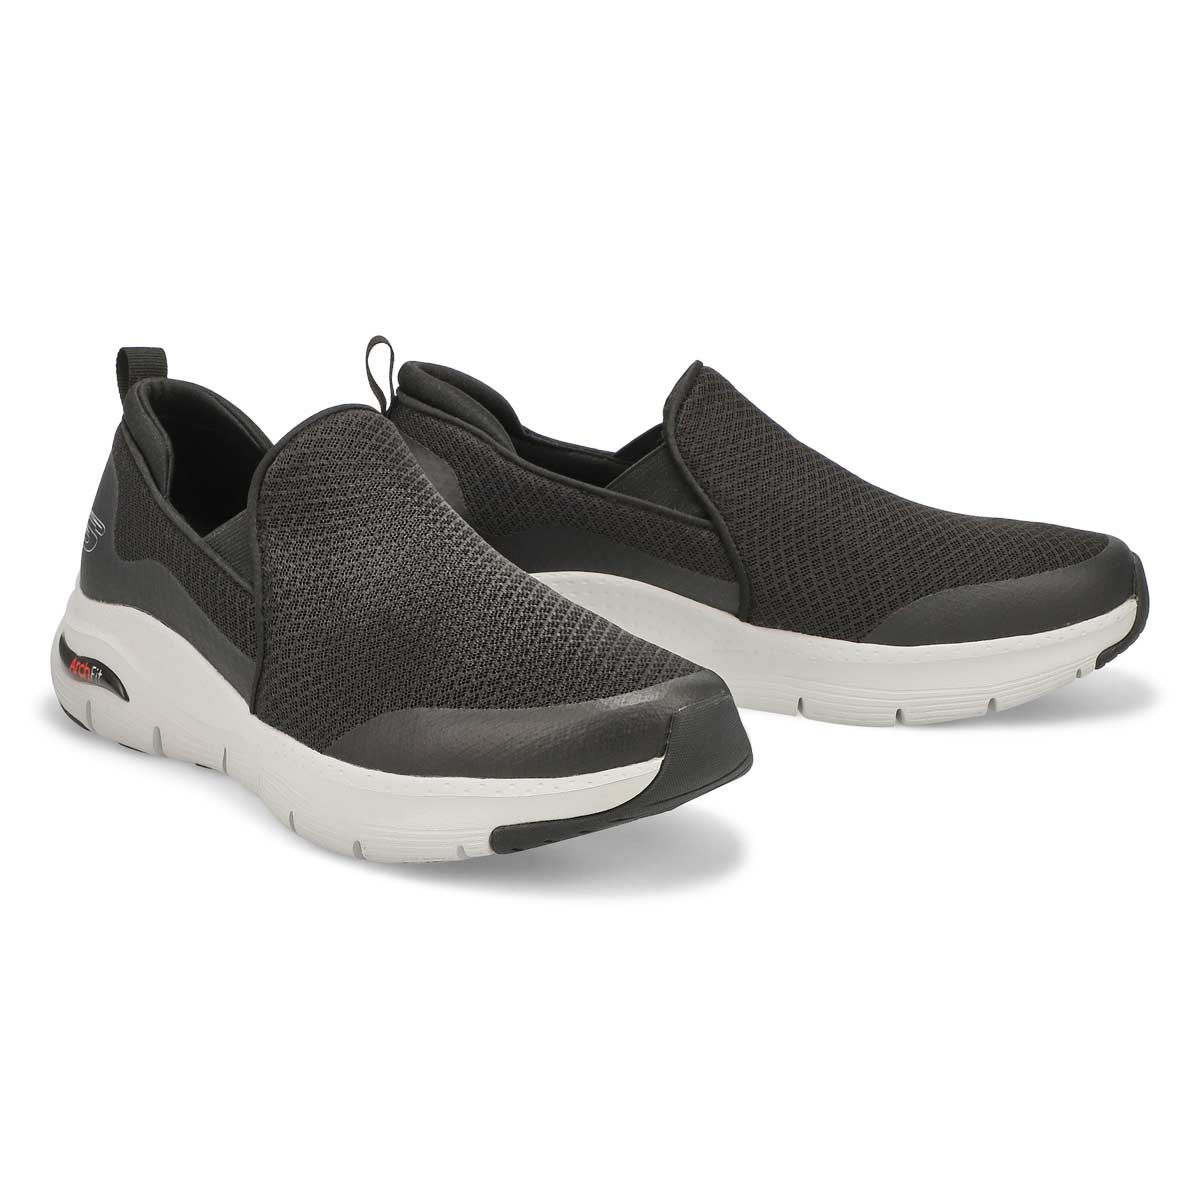 Men's Arch Fit Banlin Sneakers- Black/White